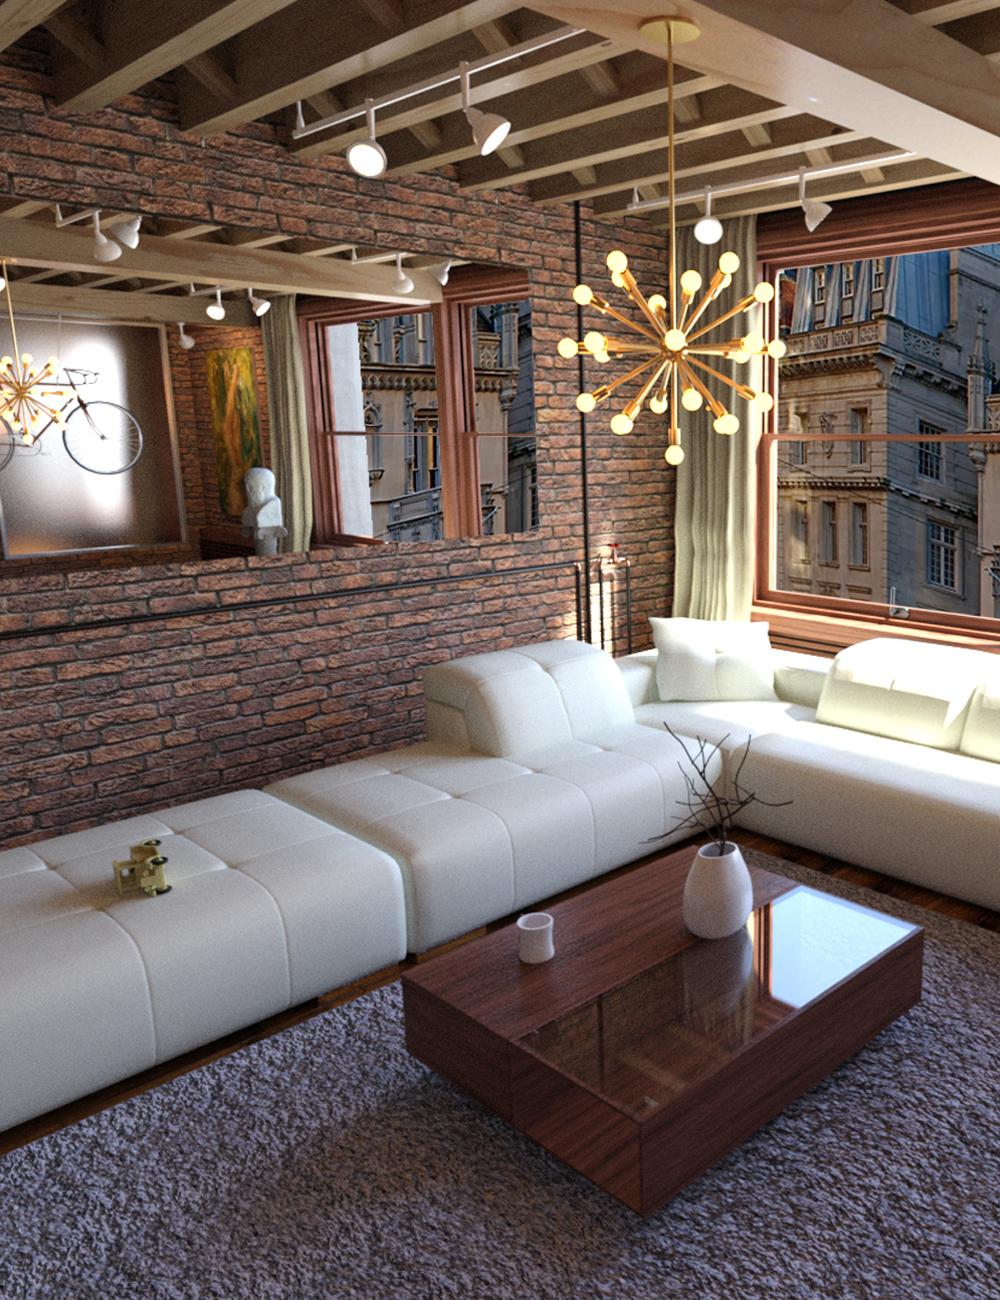 NY Living Room by: Digitallab3D, 3D Models by Daz 3D